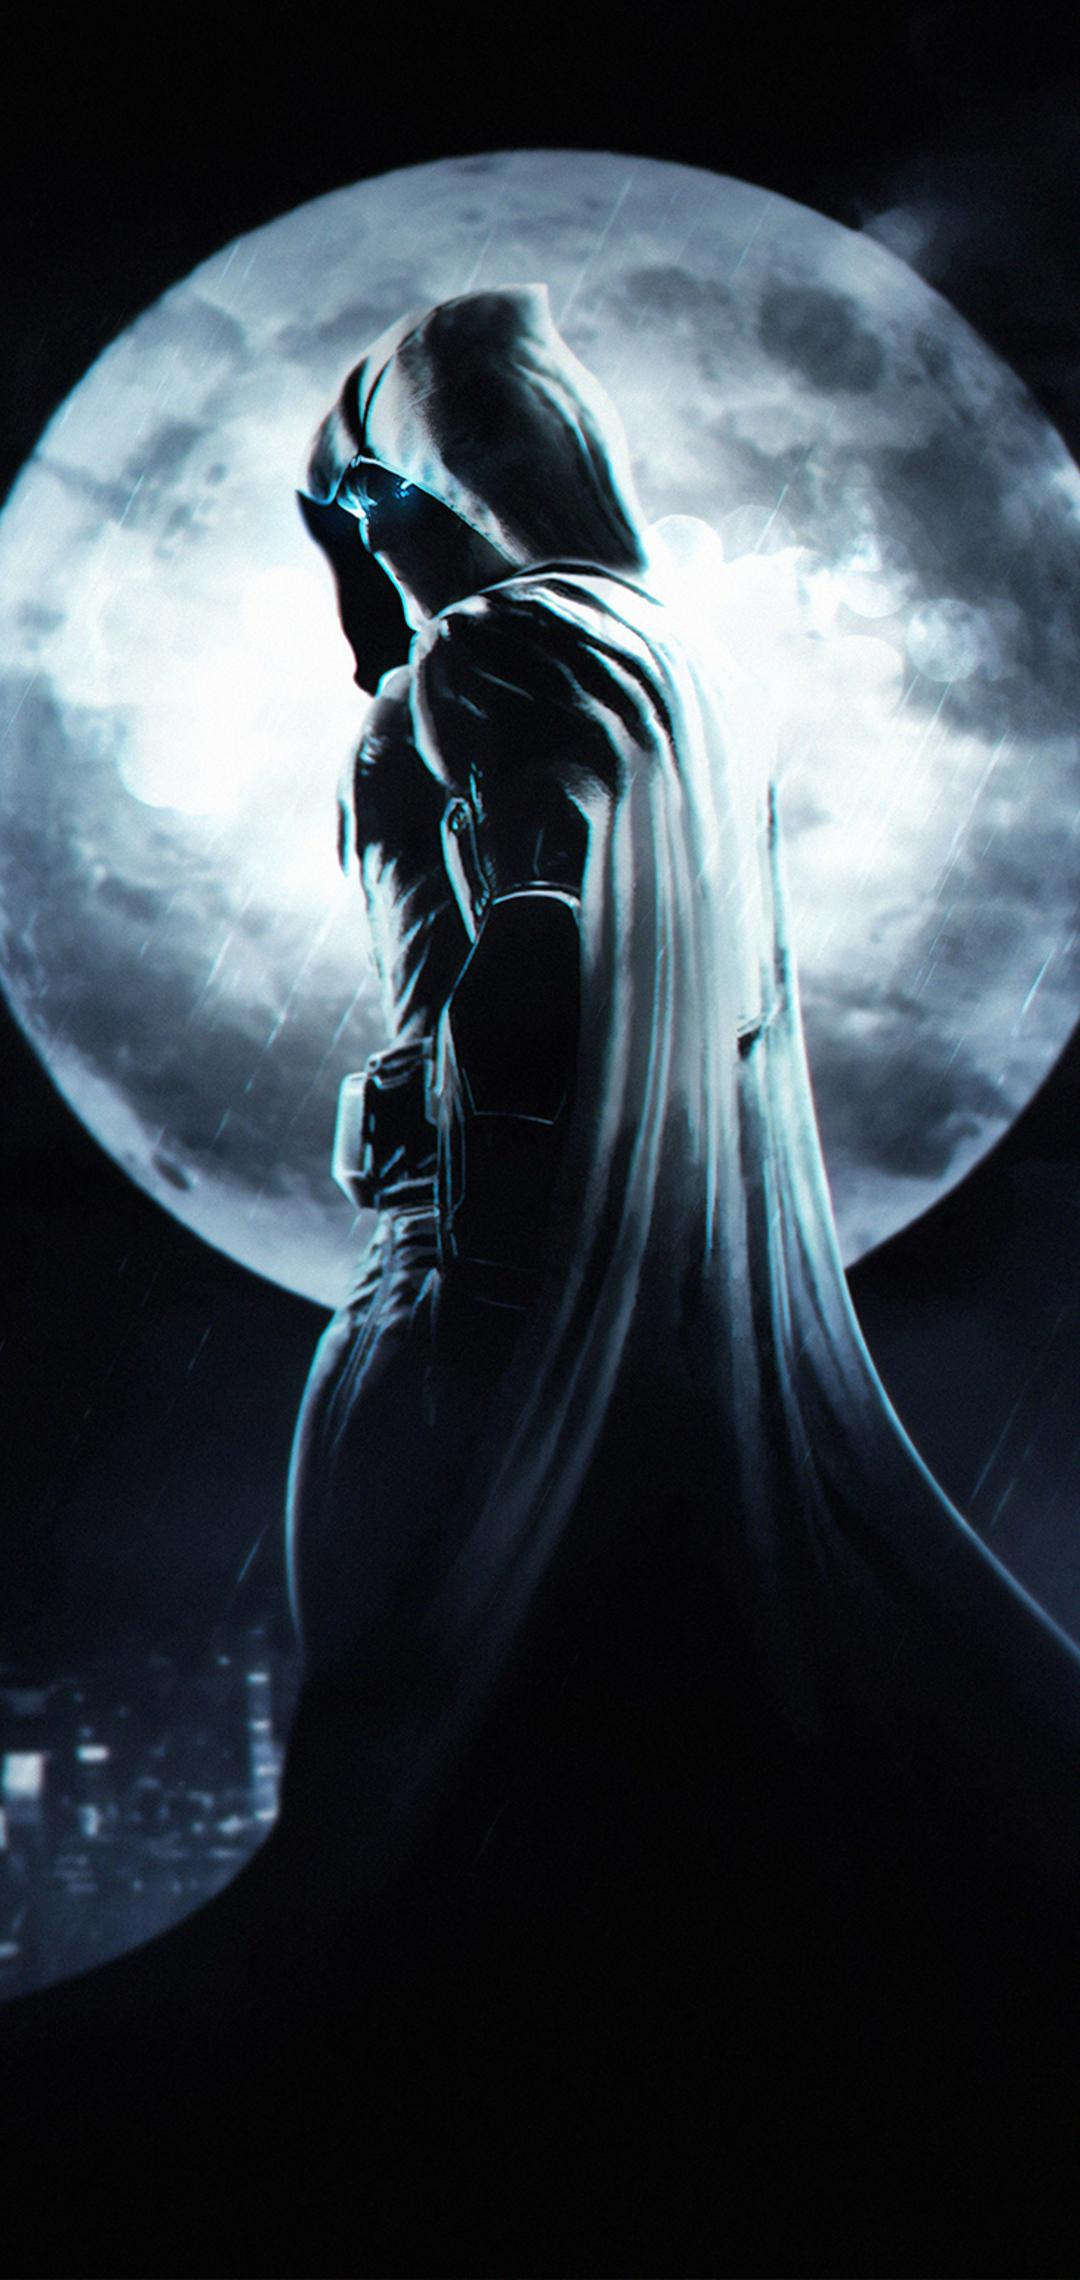 moon-knight-batman-arkham-knight-z4.jpg